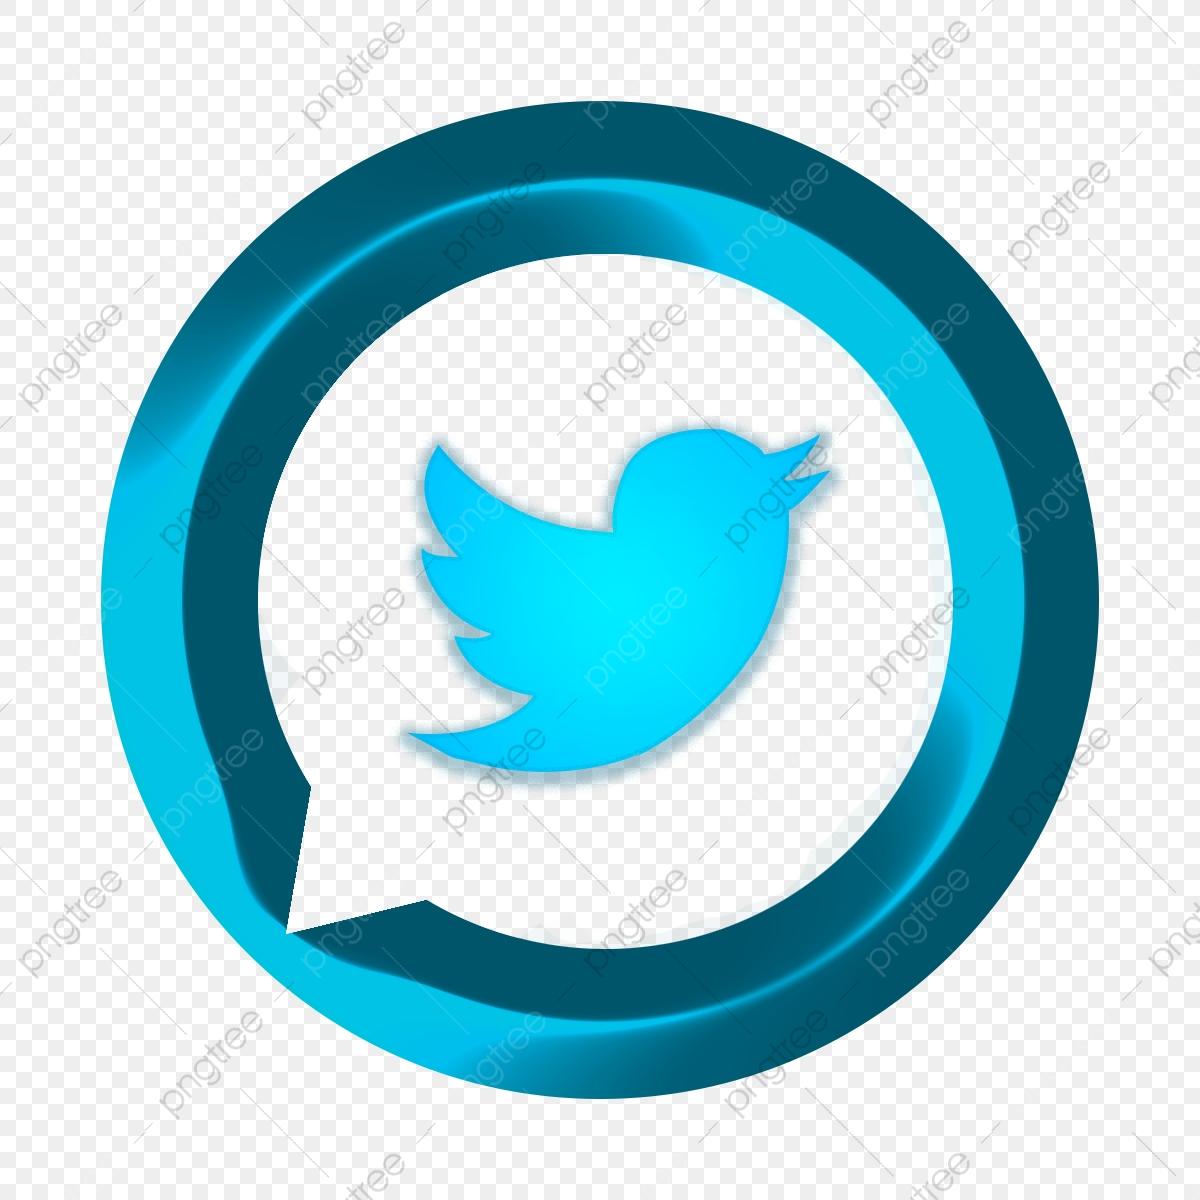 Twitter Color Icon, Twitter Logo, Twitter Vector, Twitter.